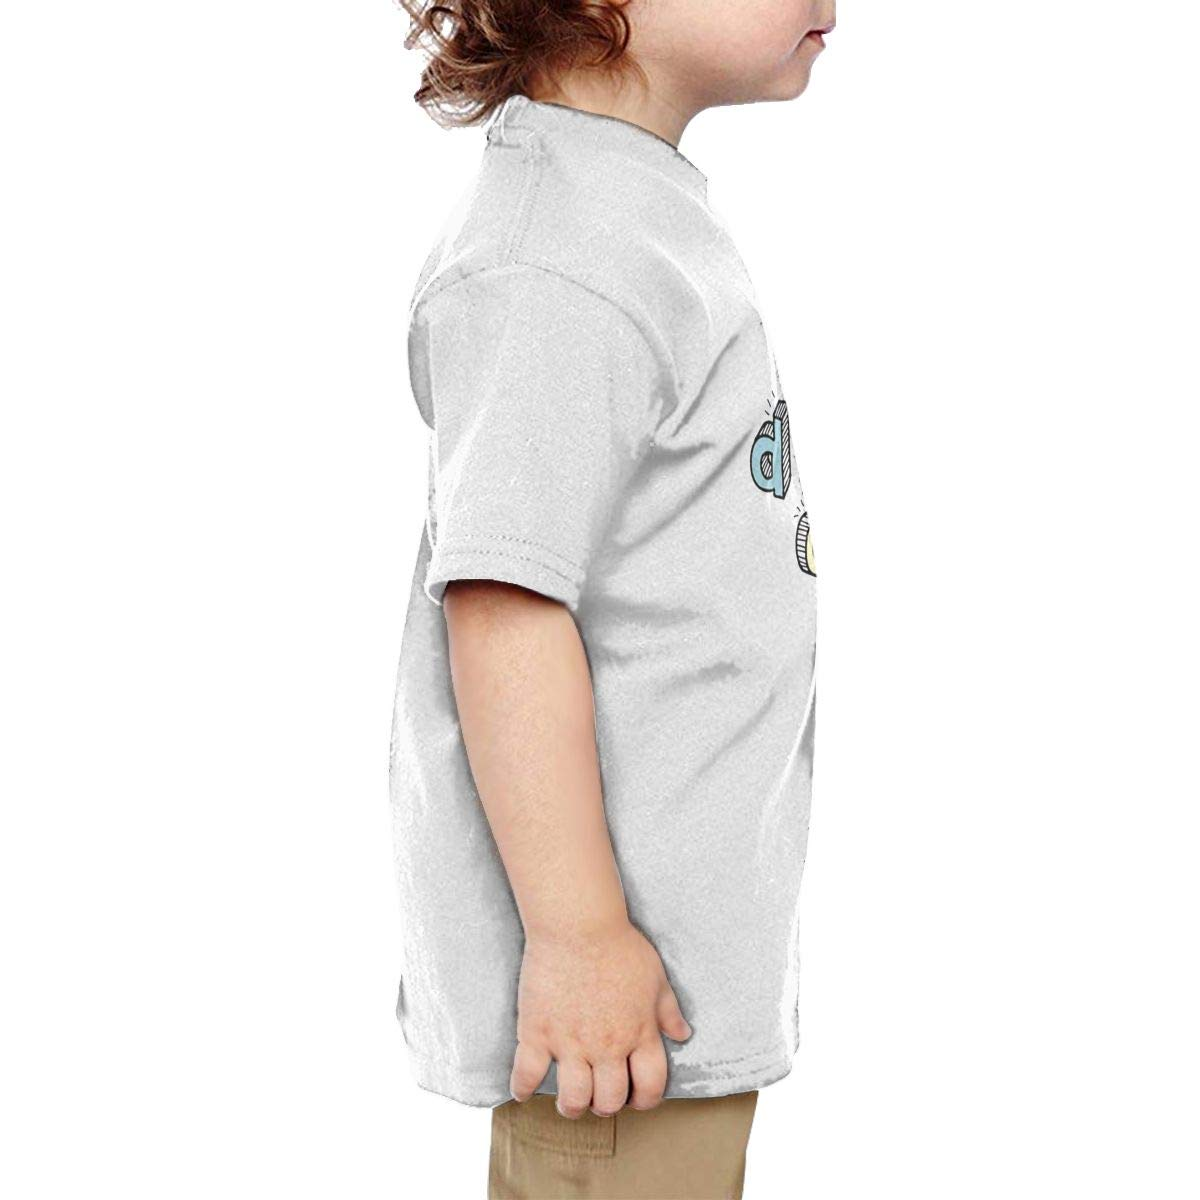 Chunmmmmm I Donut Care Baby Boy Short Sleeve Round Neck Cotton Tshit